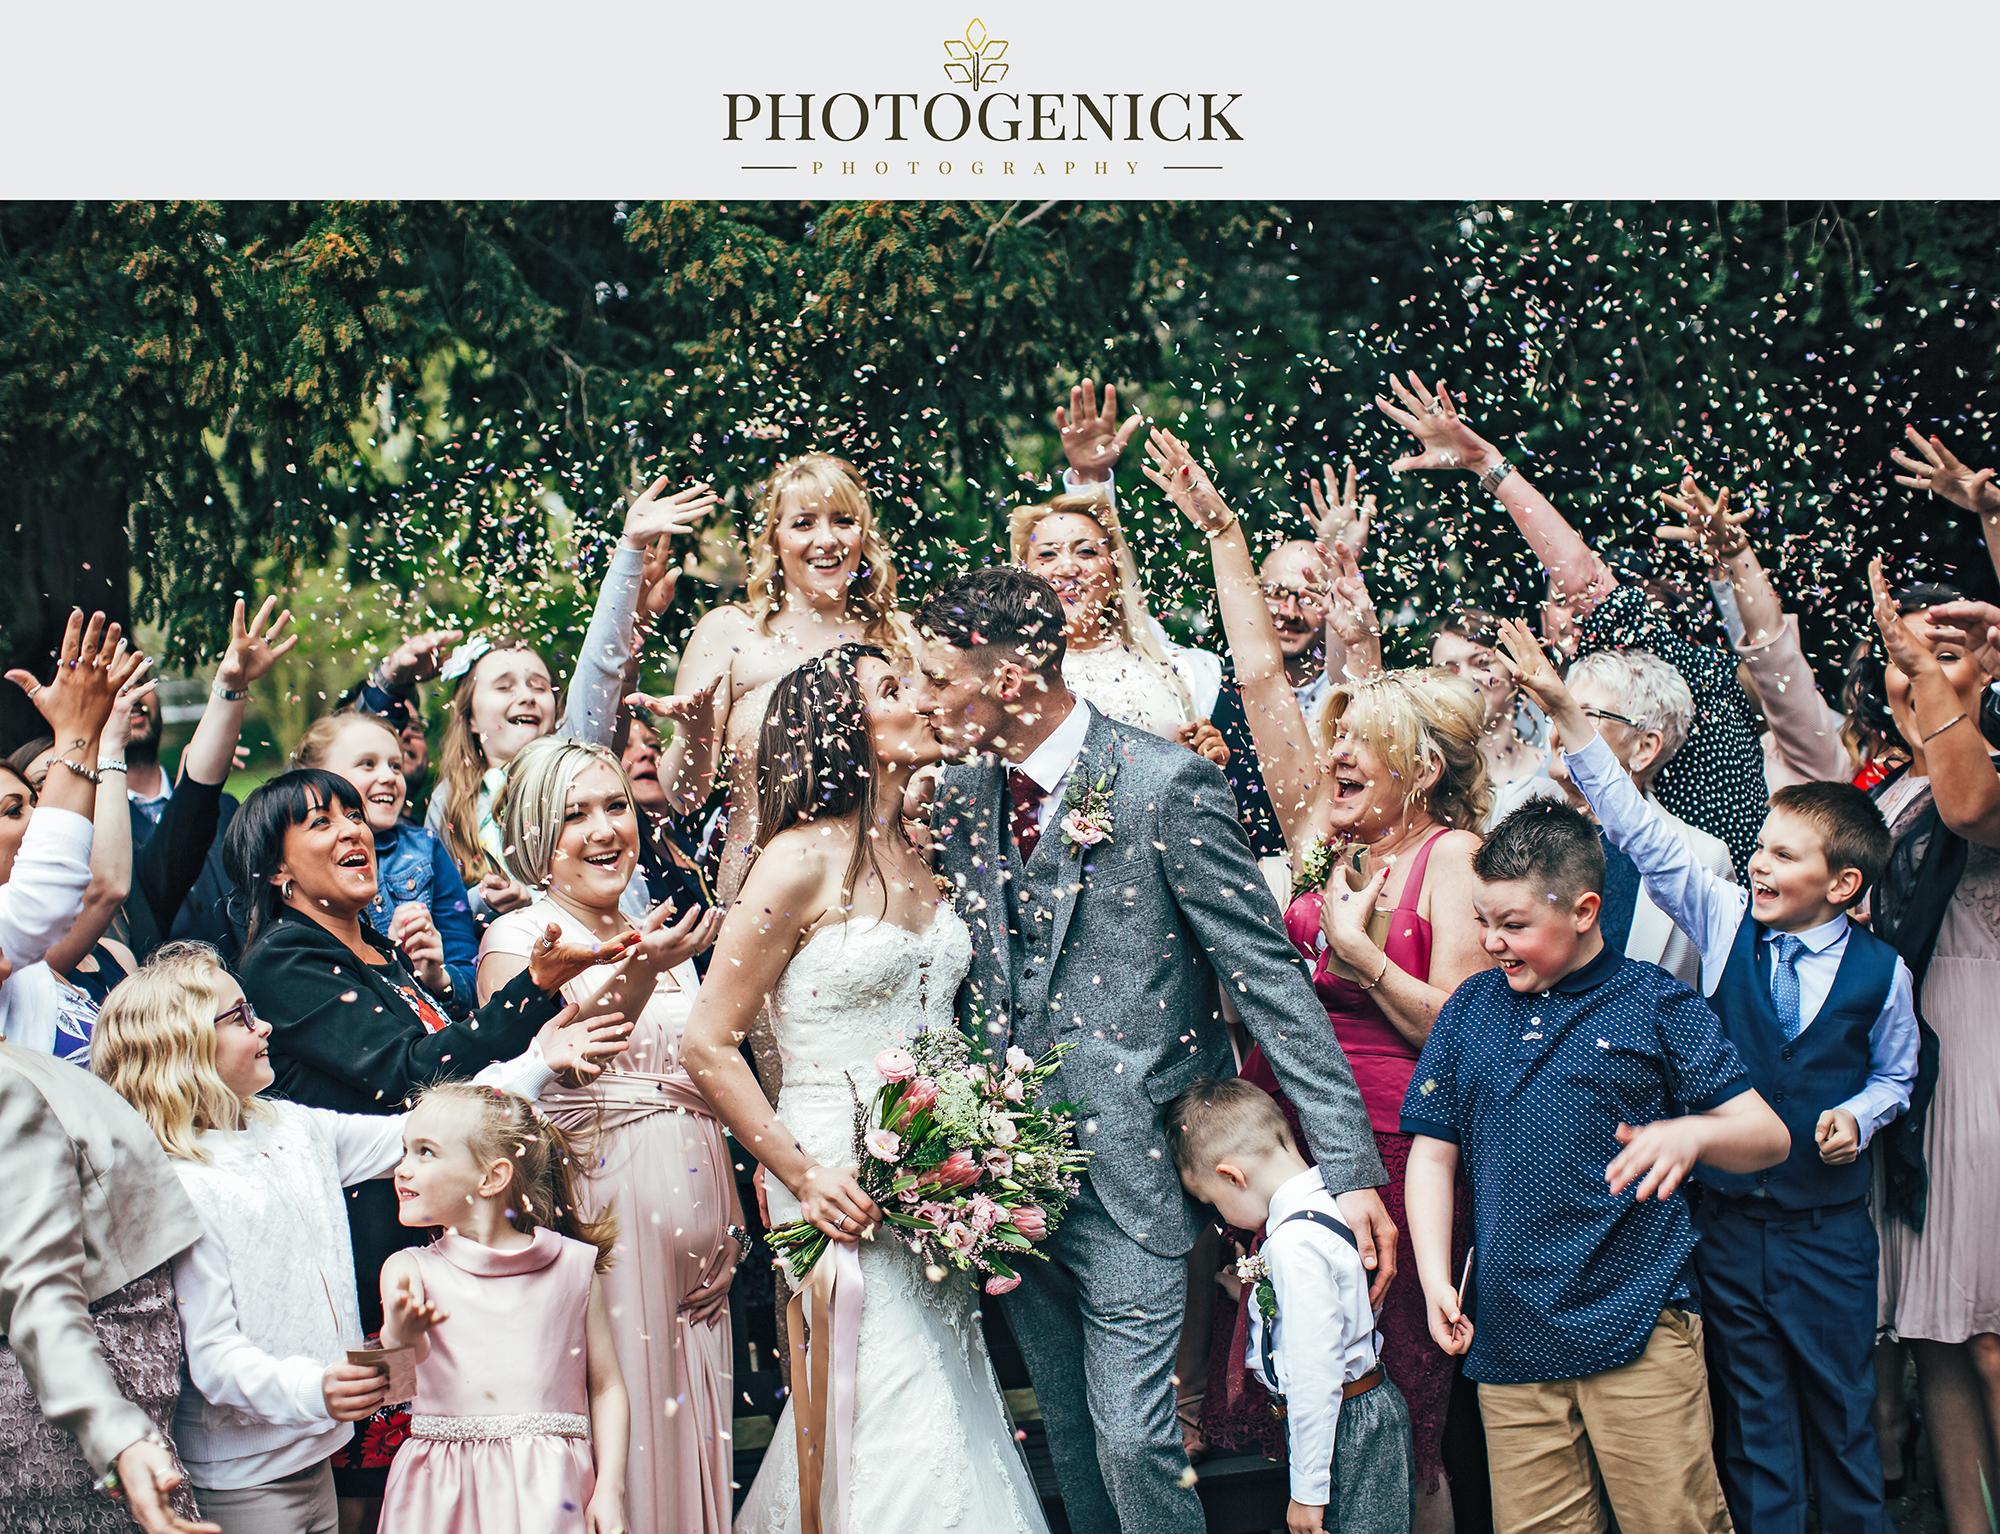 vintage wedding photographers in rotherham, Yorkshire